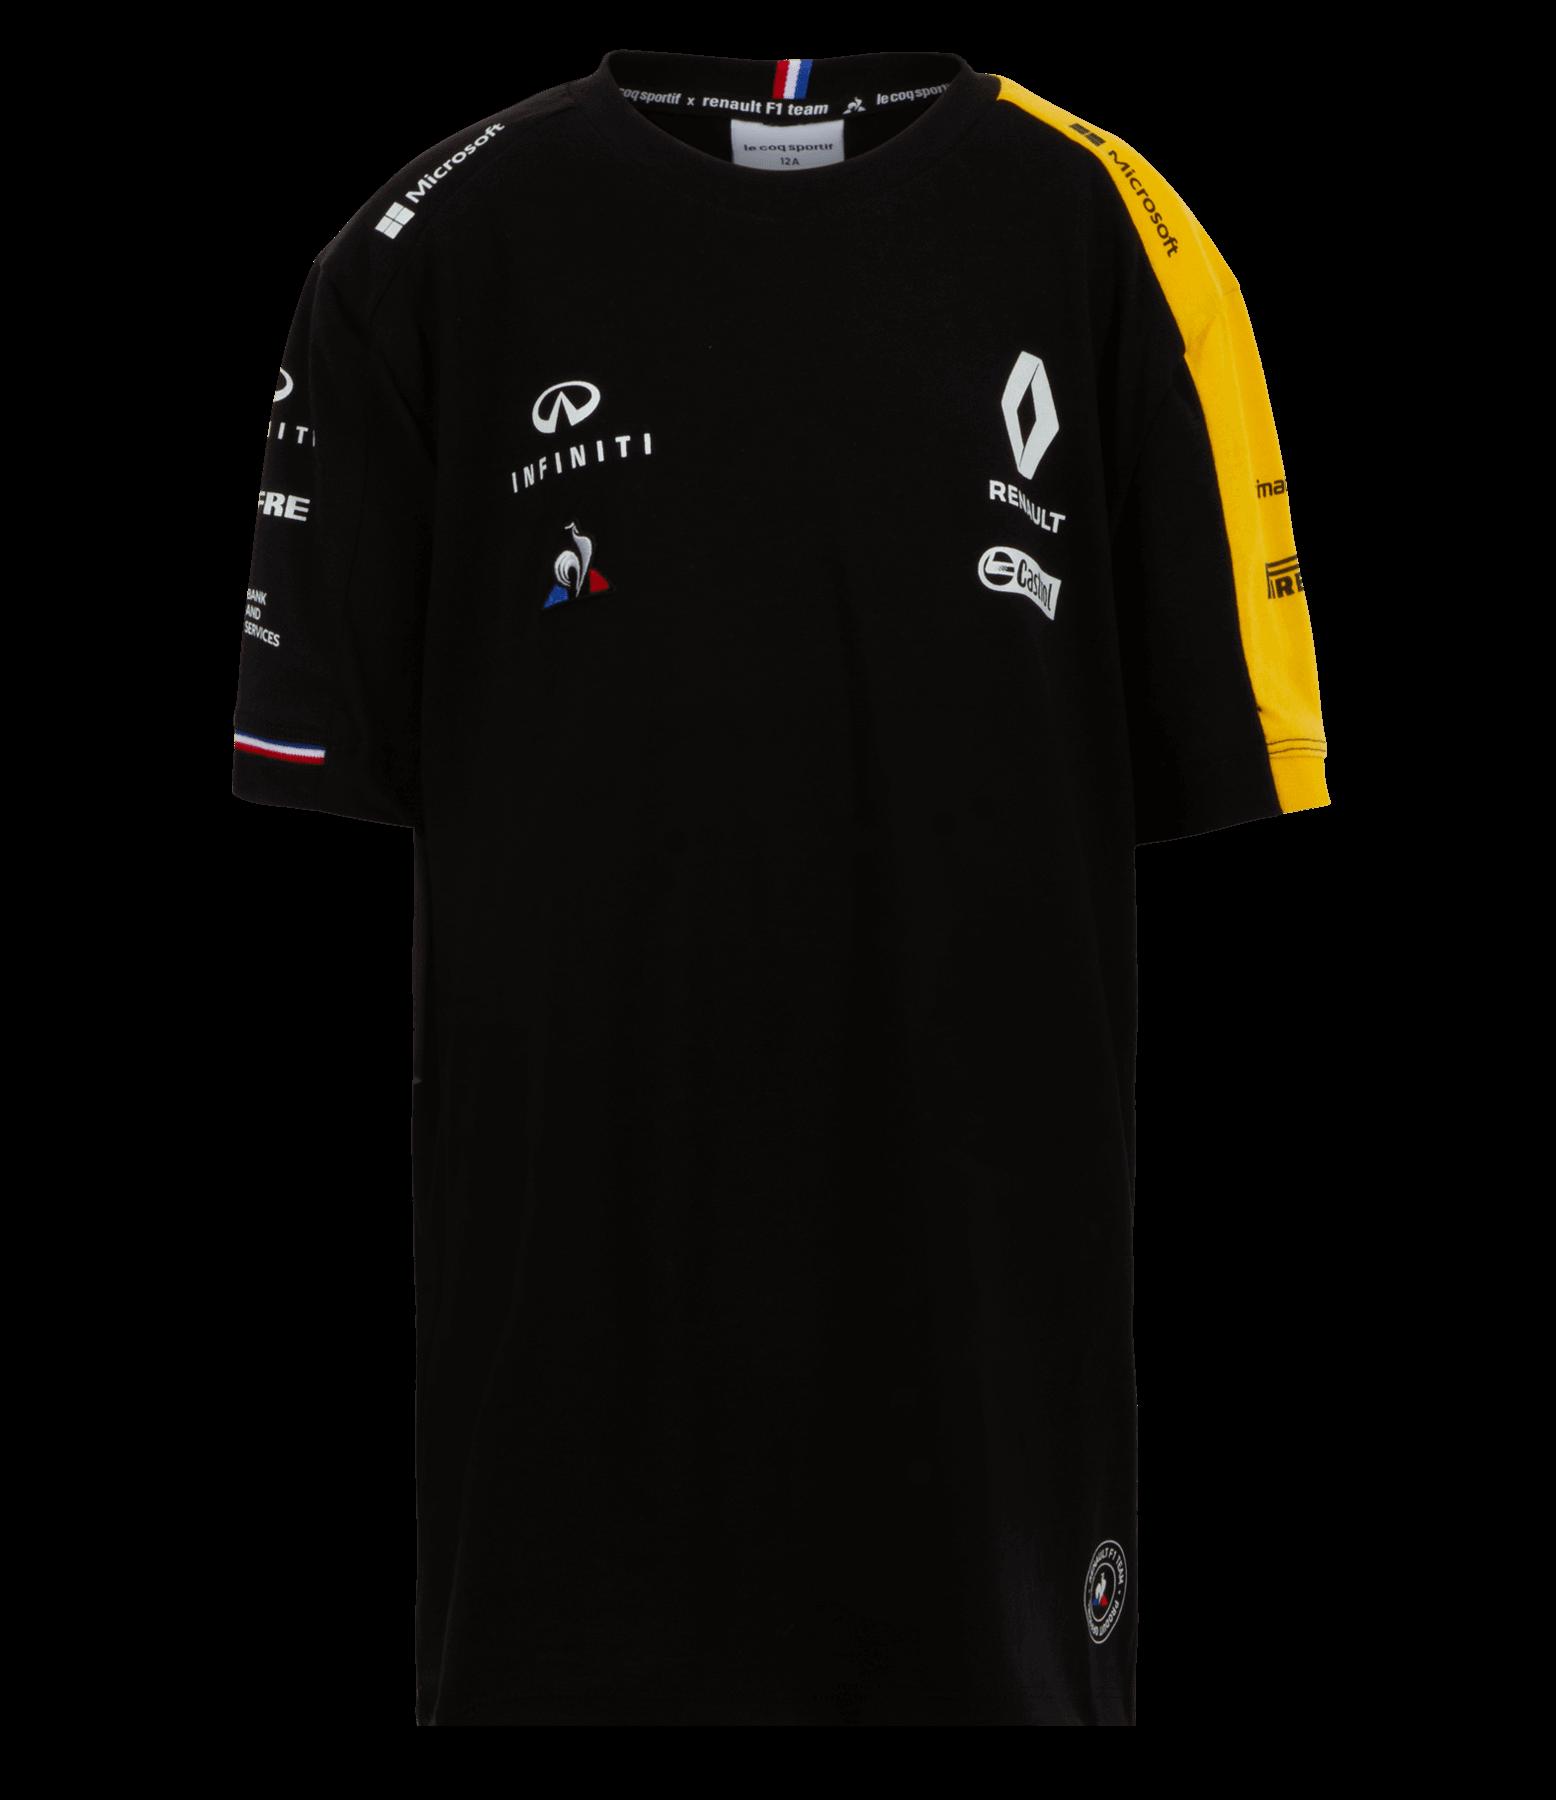 RENAULT F1® TEAM 2019 kid's t-shirt - black